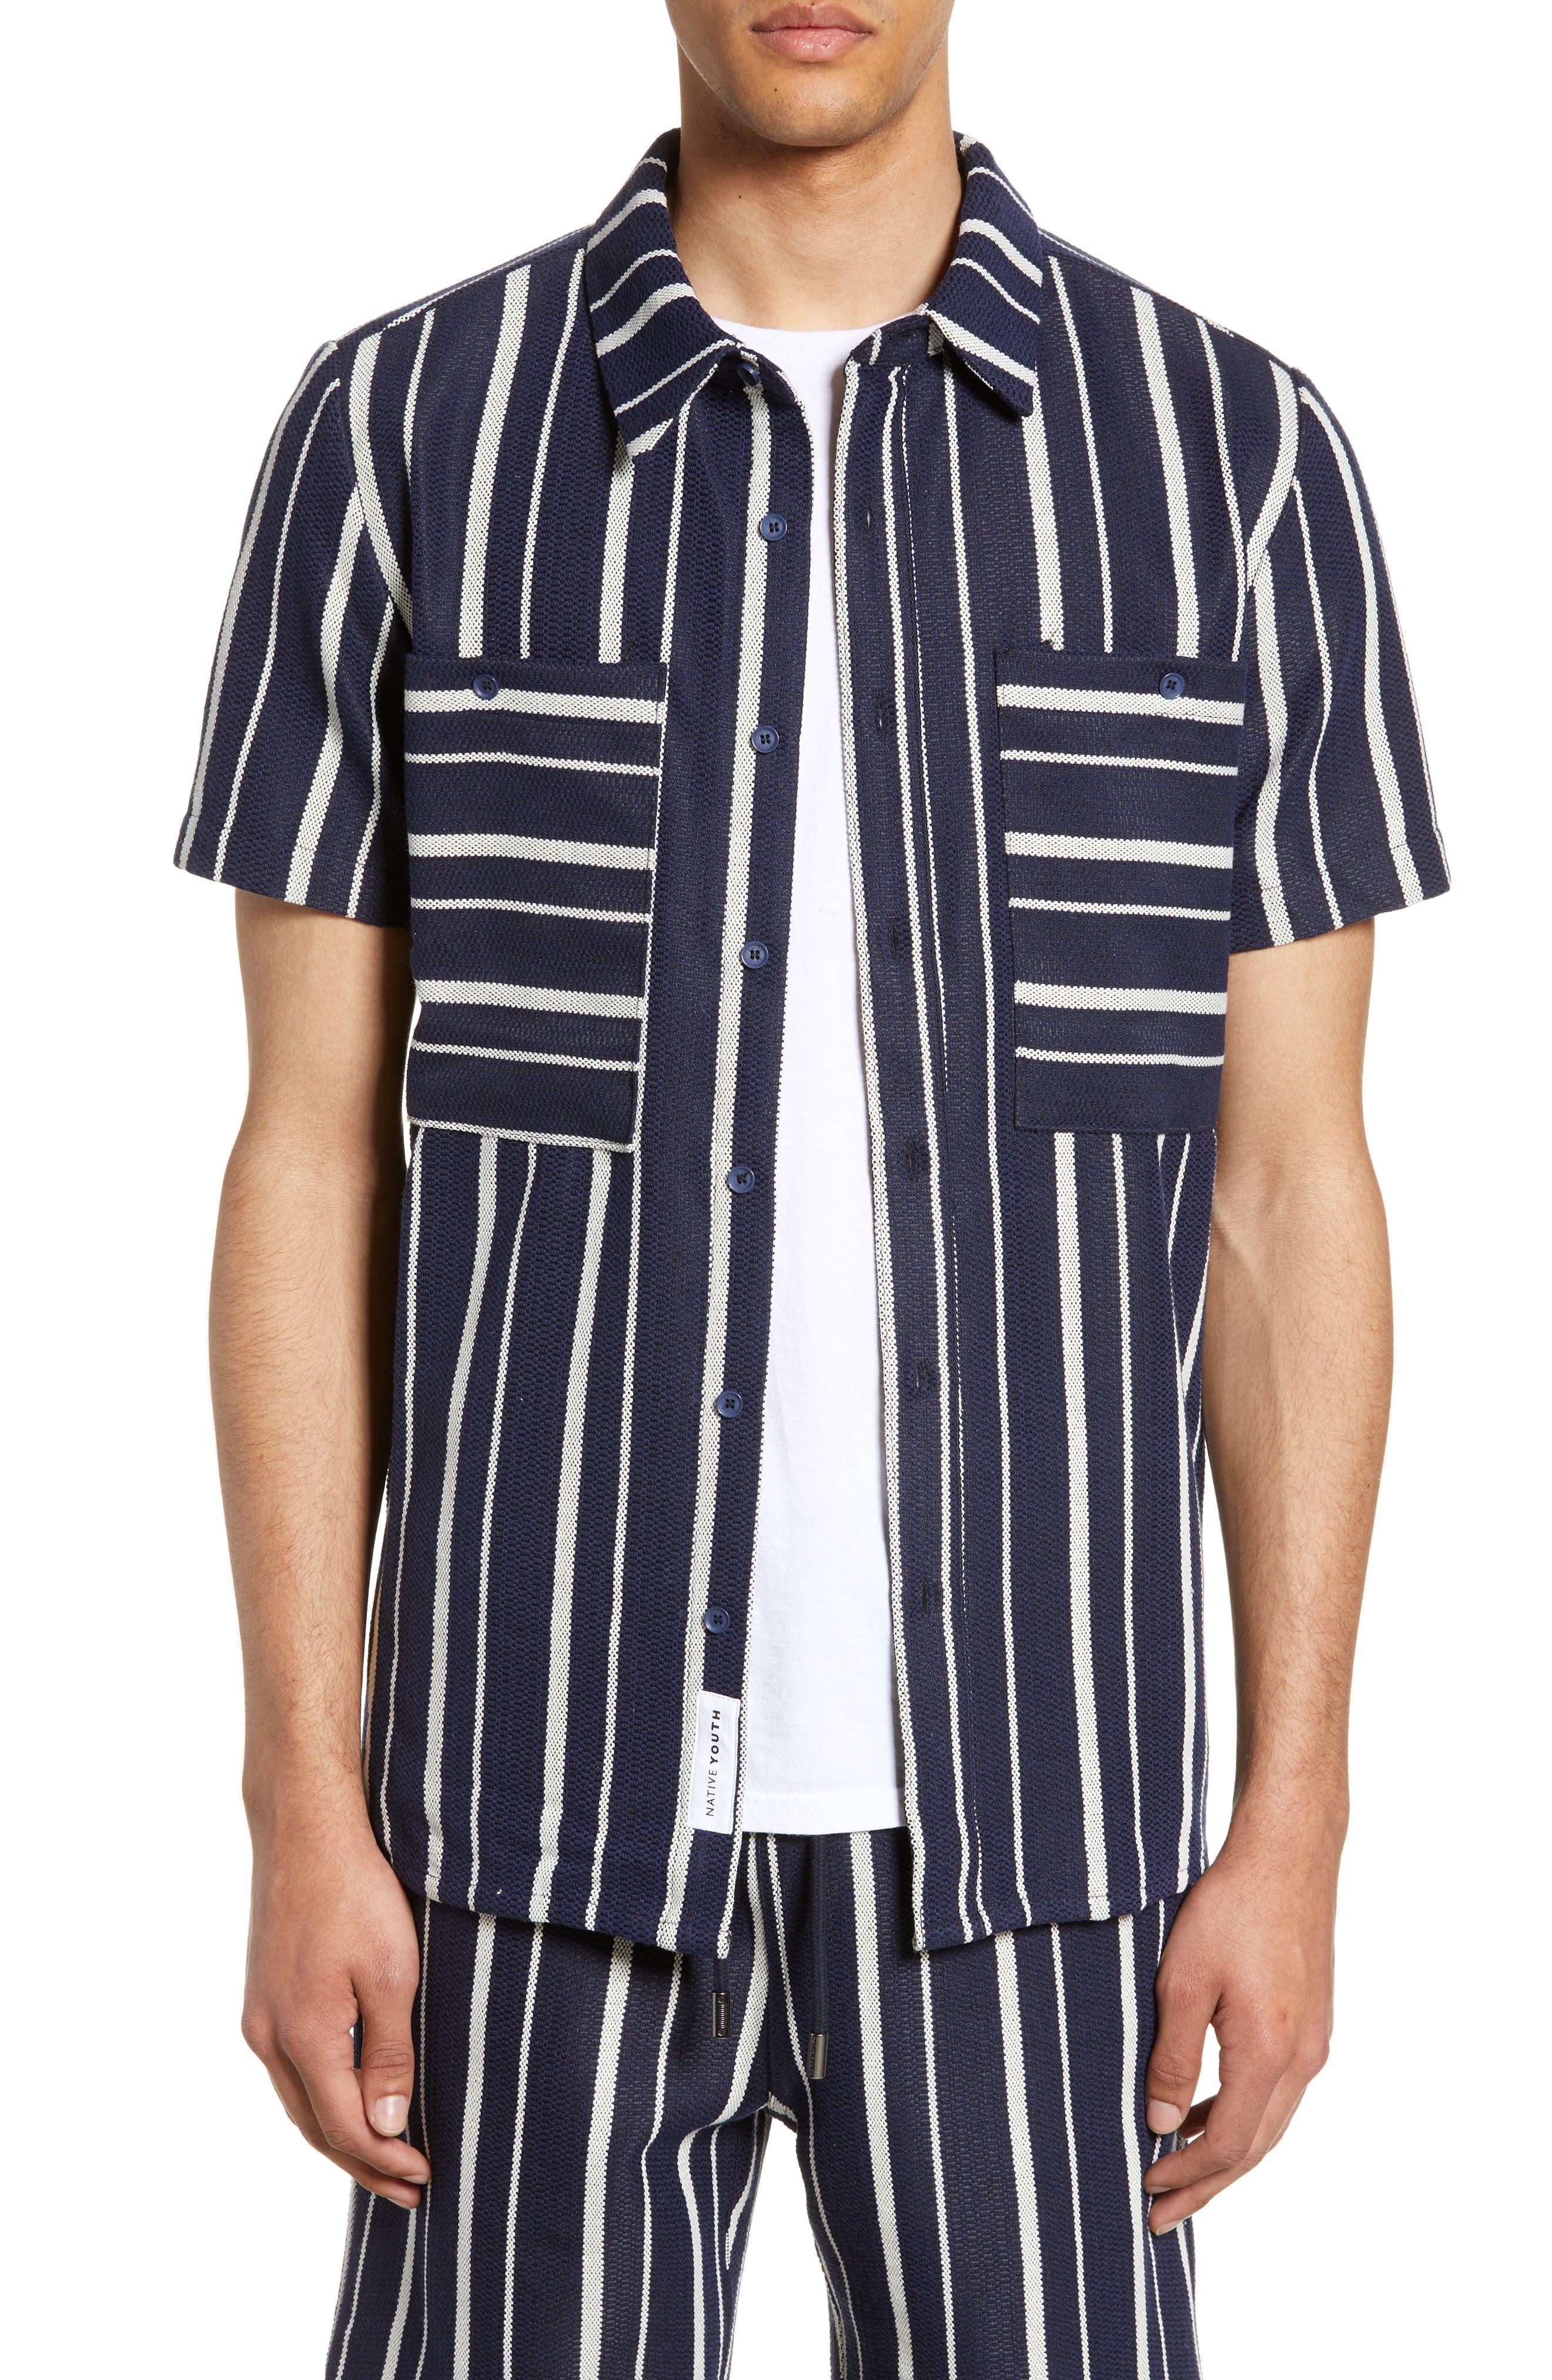 Vintage Men's Swimsuits – 1930s to 1970s History Mens Native Youth Glover Stripe Leisure Shirt $96.00 AT vintagedancer.com